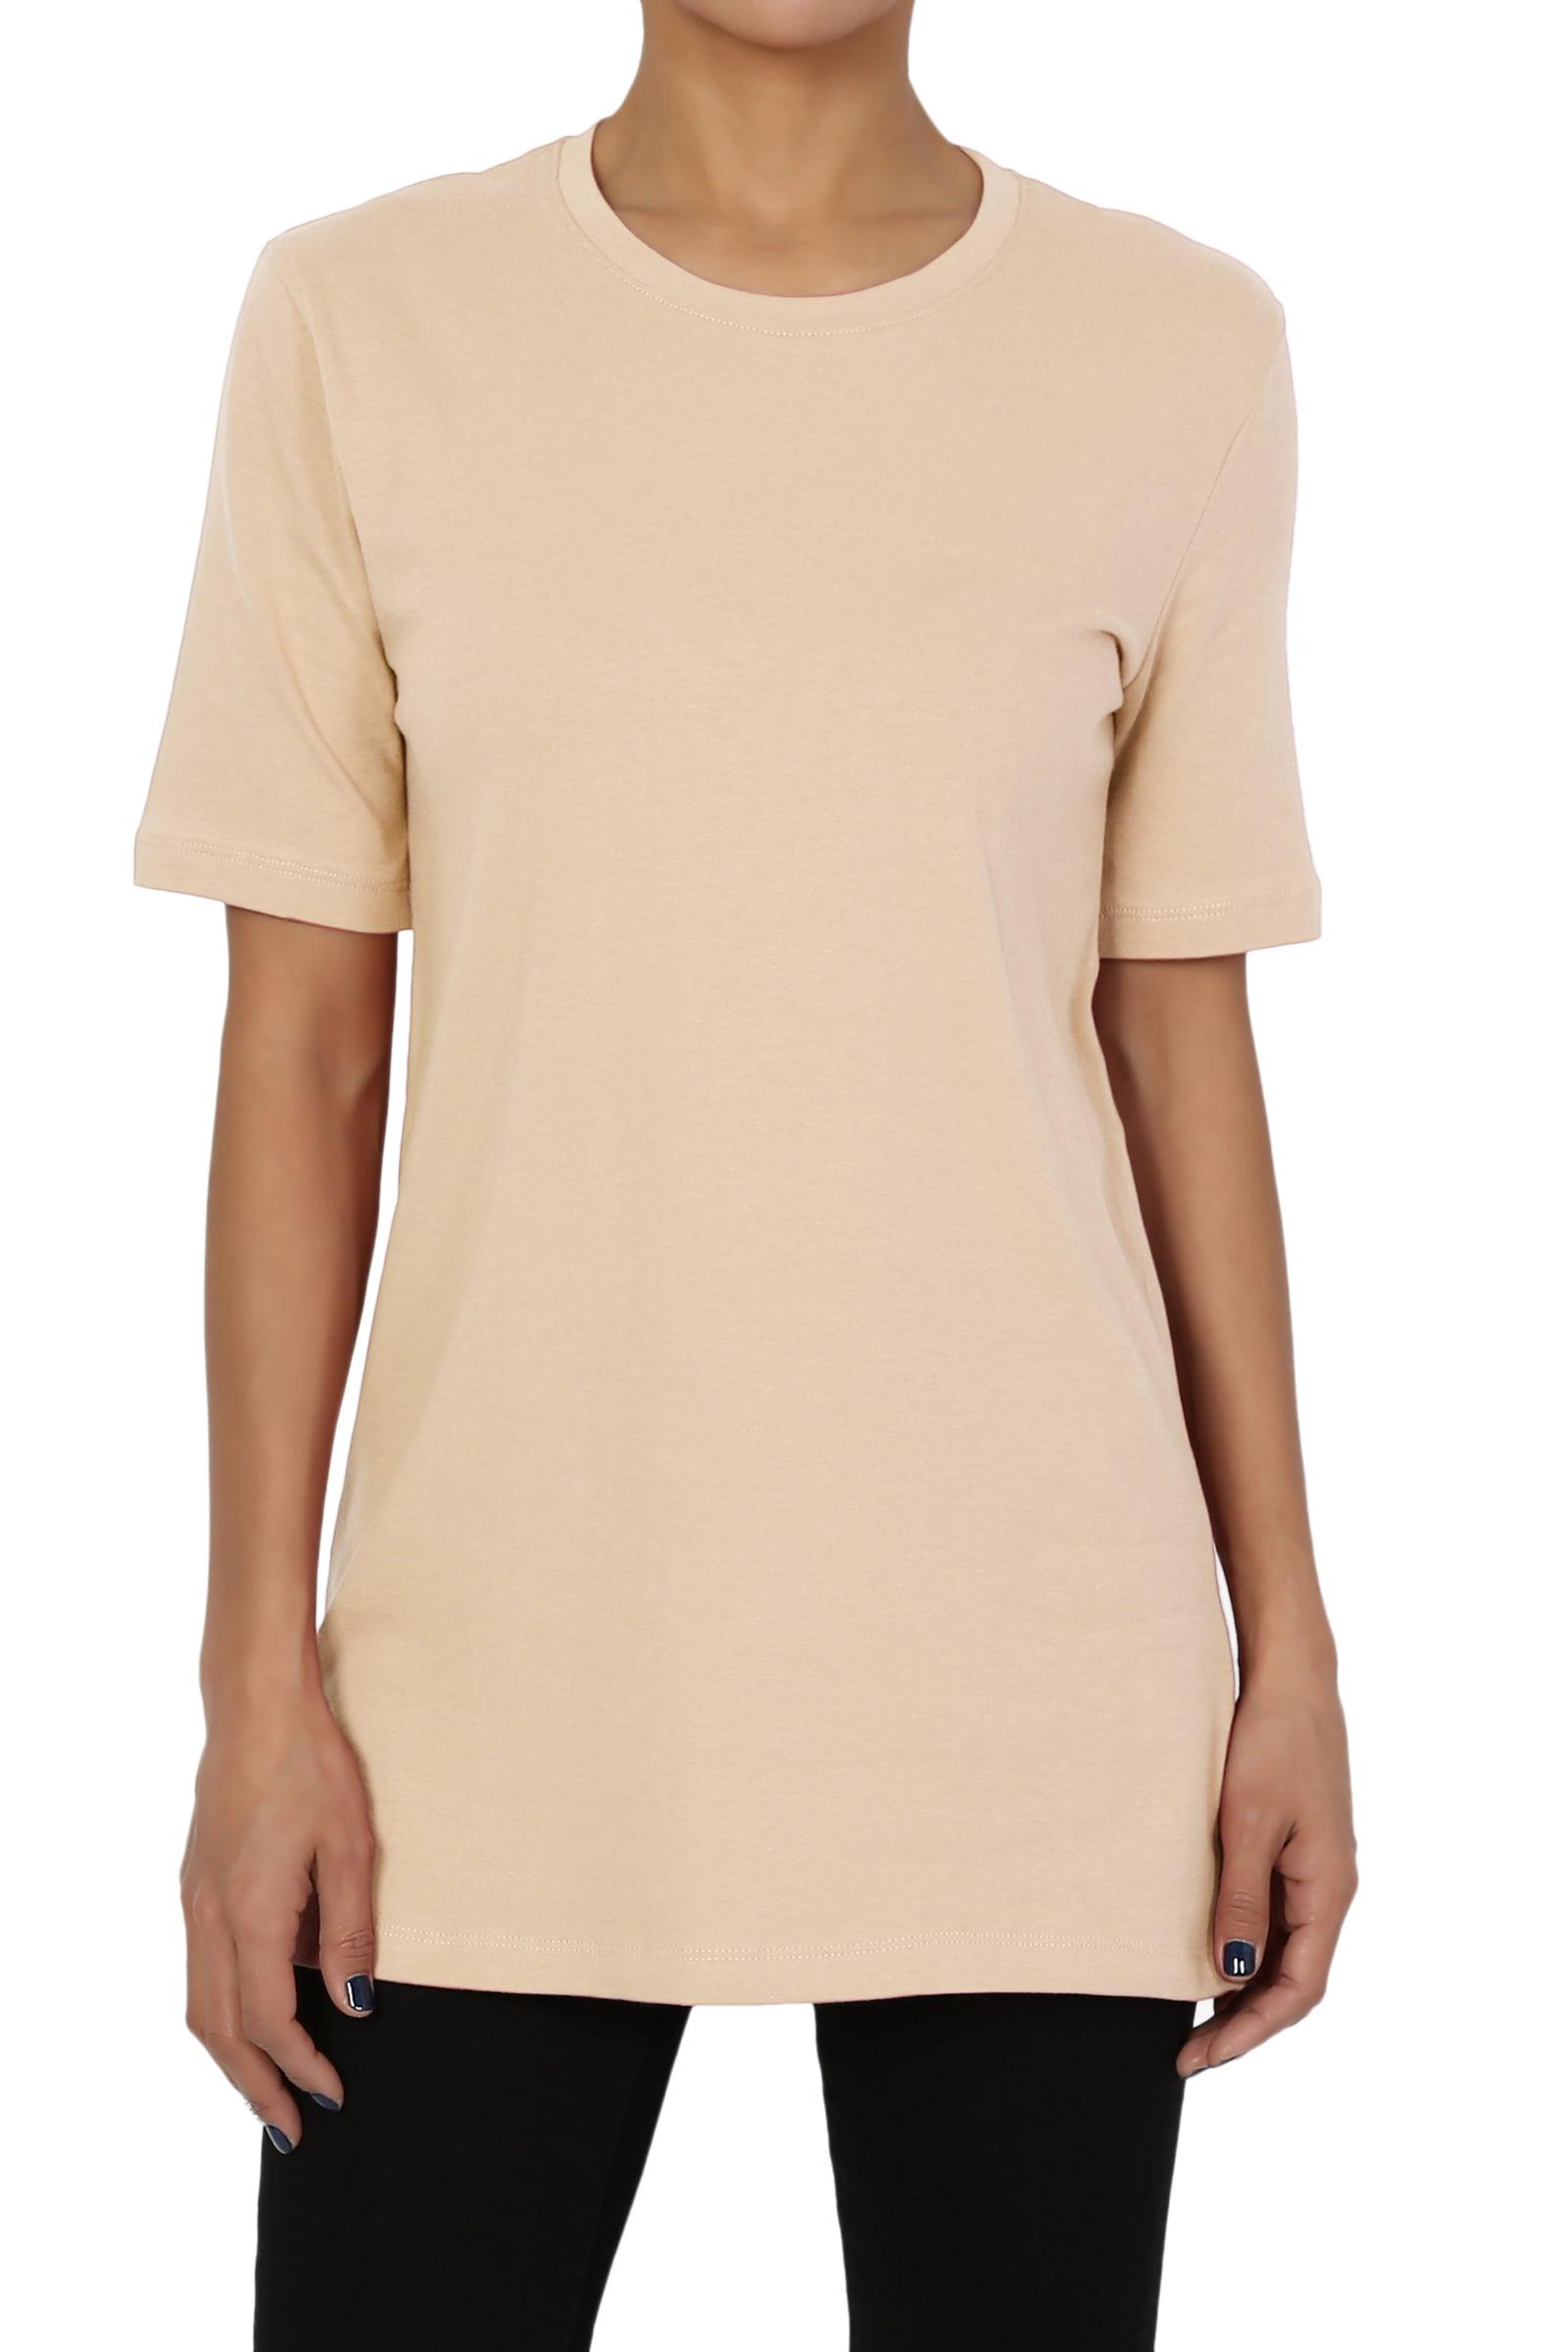 TheMogan Women's Basic Crew Neck Short Sleeve Relaxed Boyfriend Cotton T-Shirt